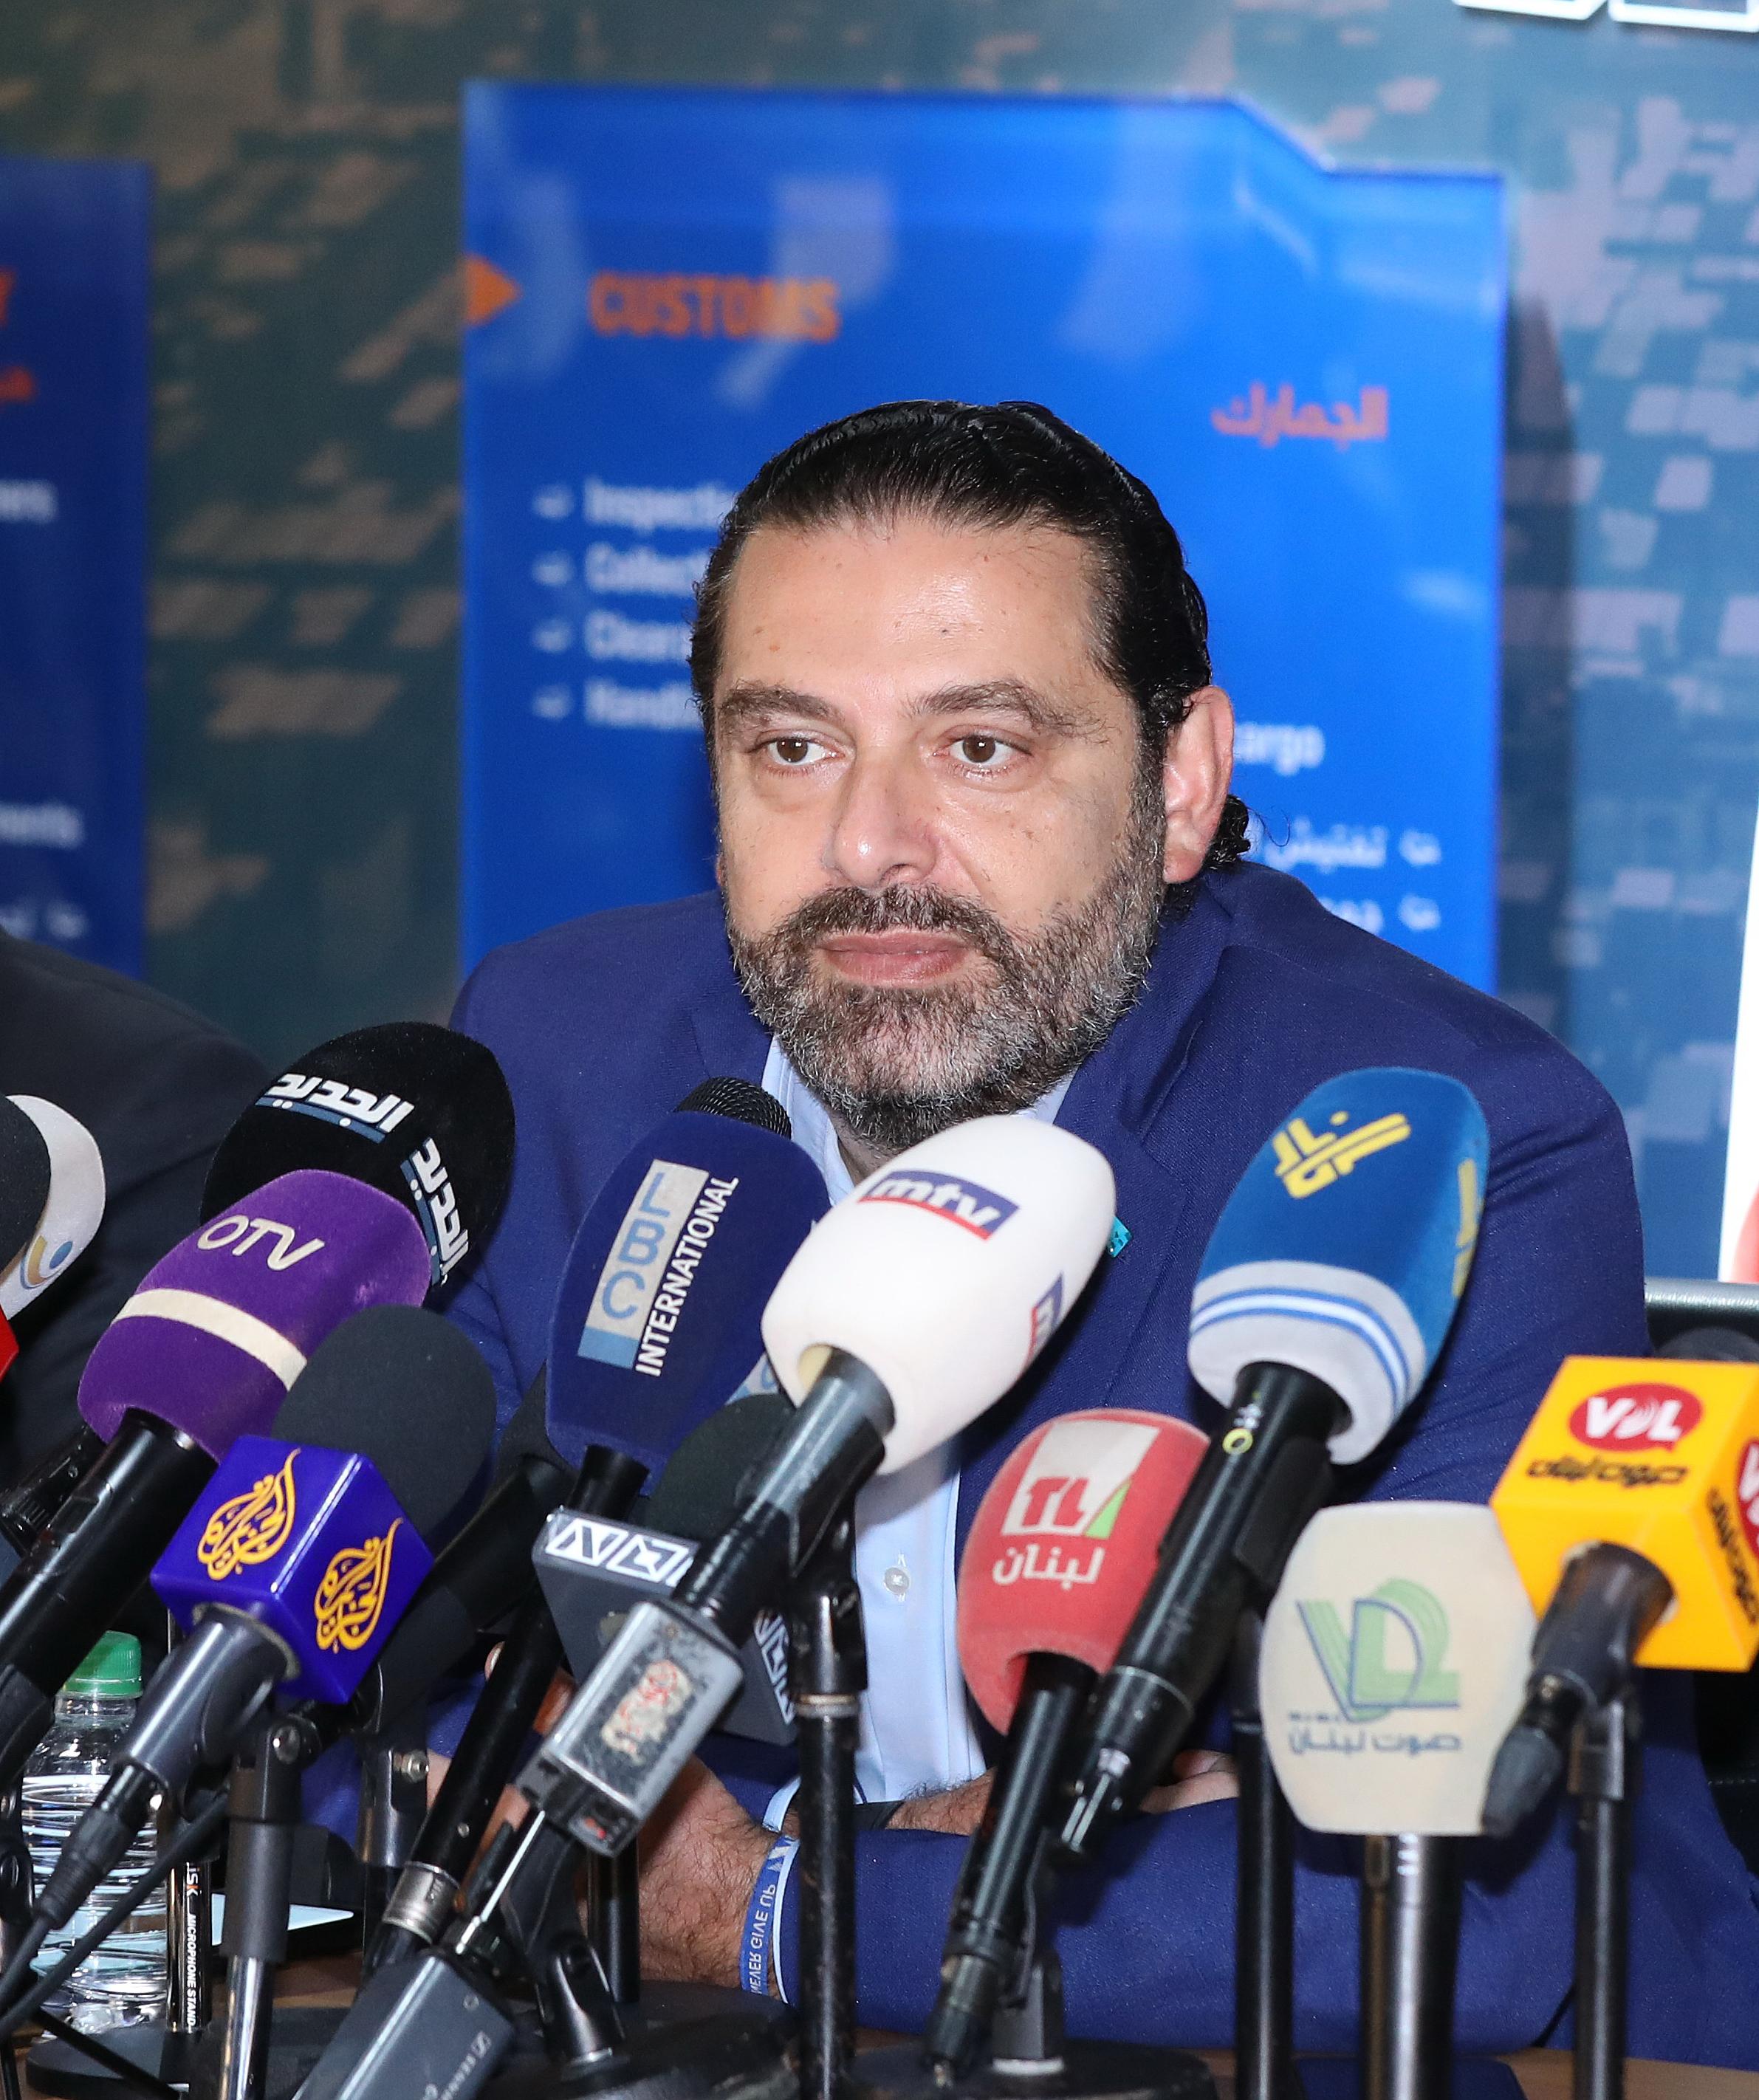 Pr Minister Saad Hariri Visits Beirut Ports 8